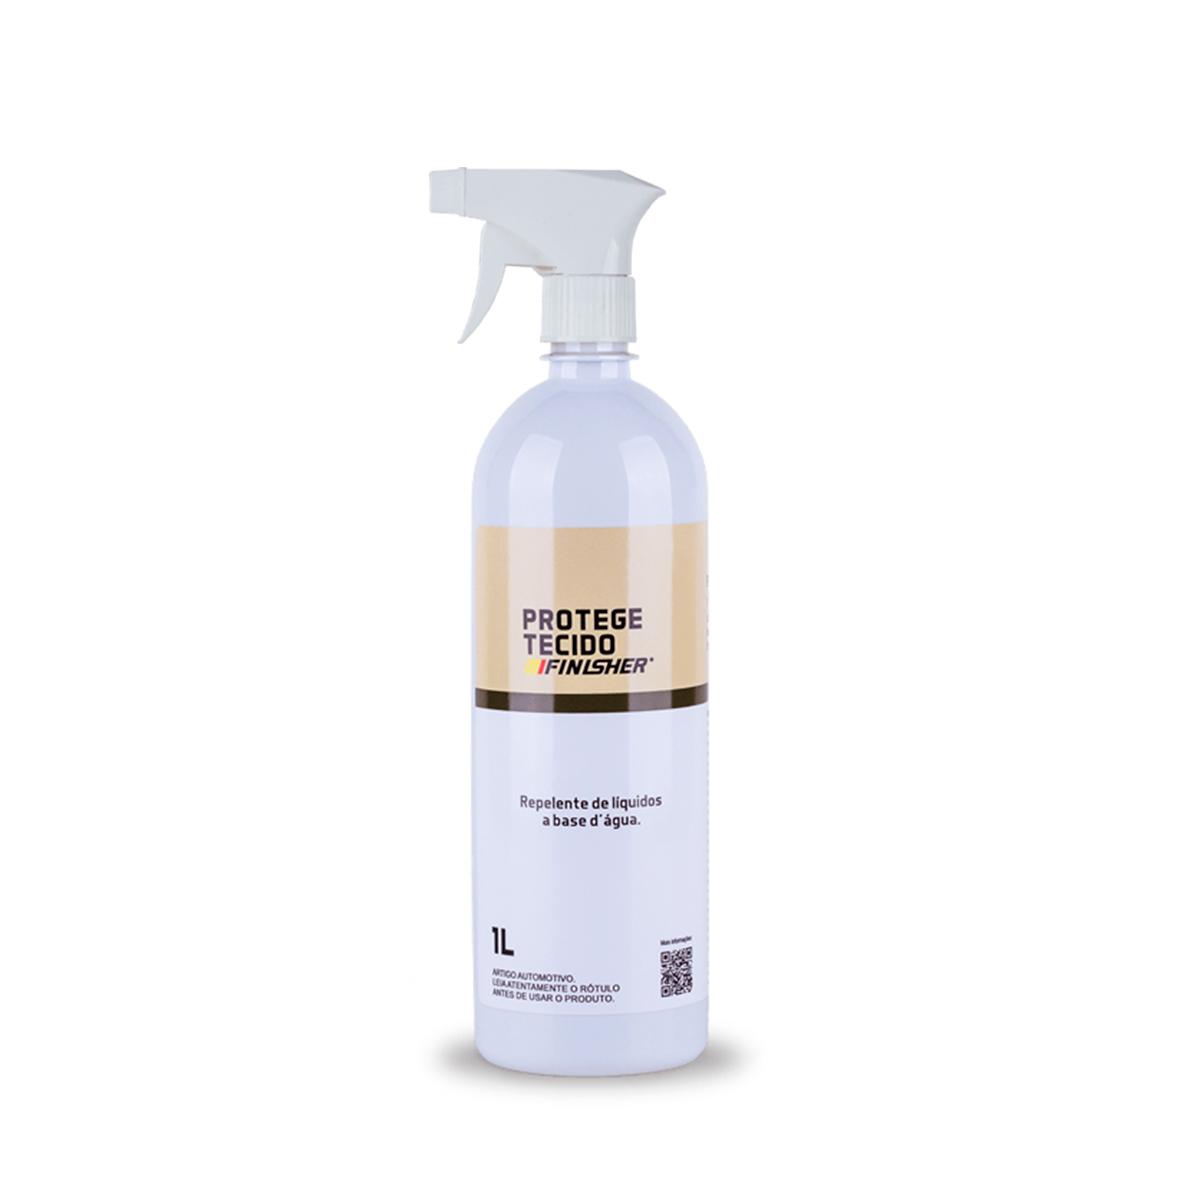 Protege Tecido Spray 1L - Finisher